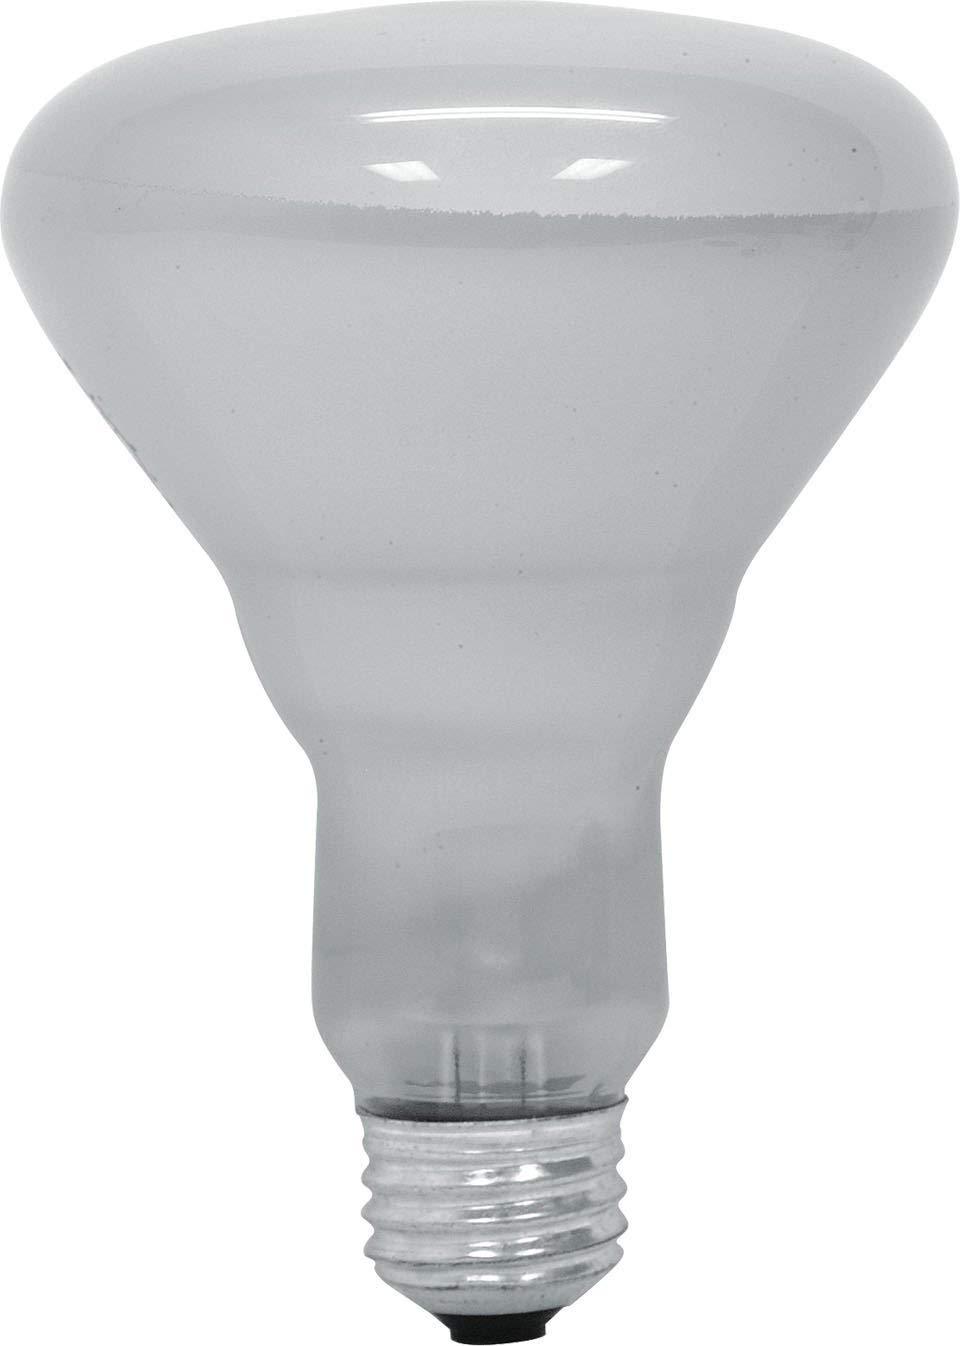 GE Lighting 65-Watt 740-Lumen Track & Recessed R30 Indoor Reflector Incandescent Light Bulb, Soft White, (12 Pack 65-Watt)